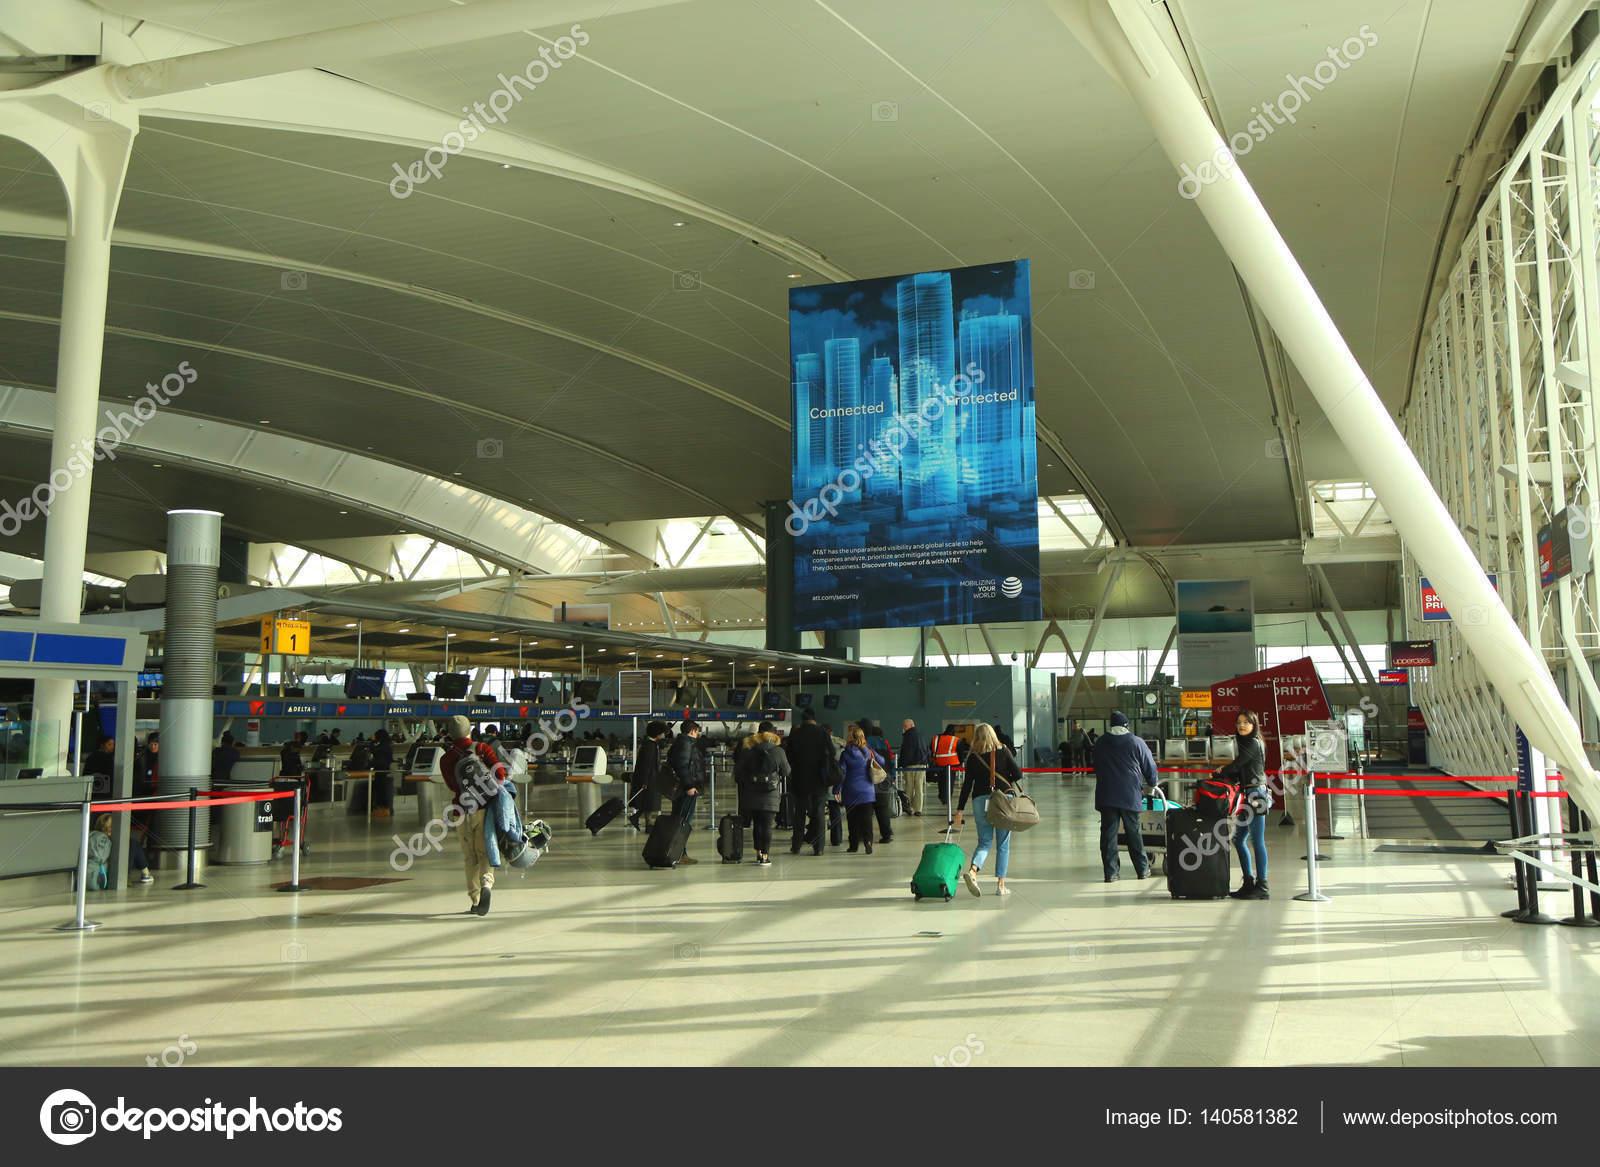 Aeroporto Jfk : Dentro do delta airline terminal 4 no aeroporto jfk em nova york